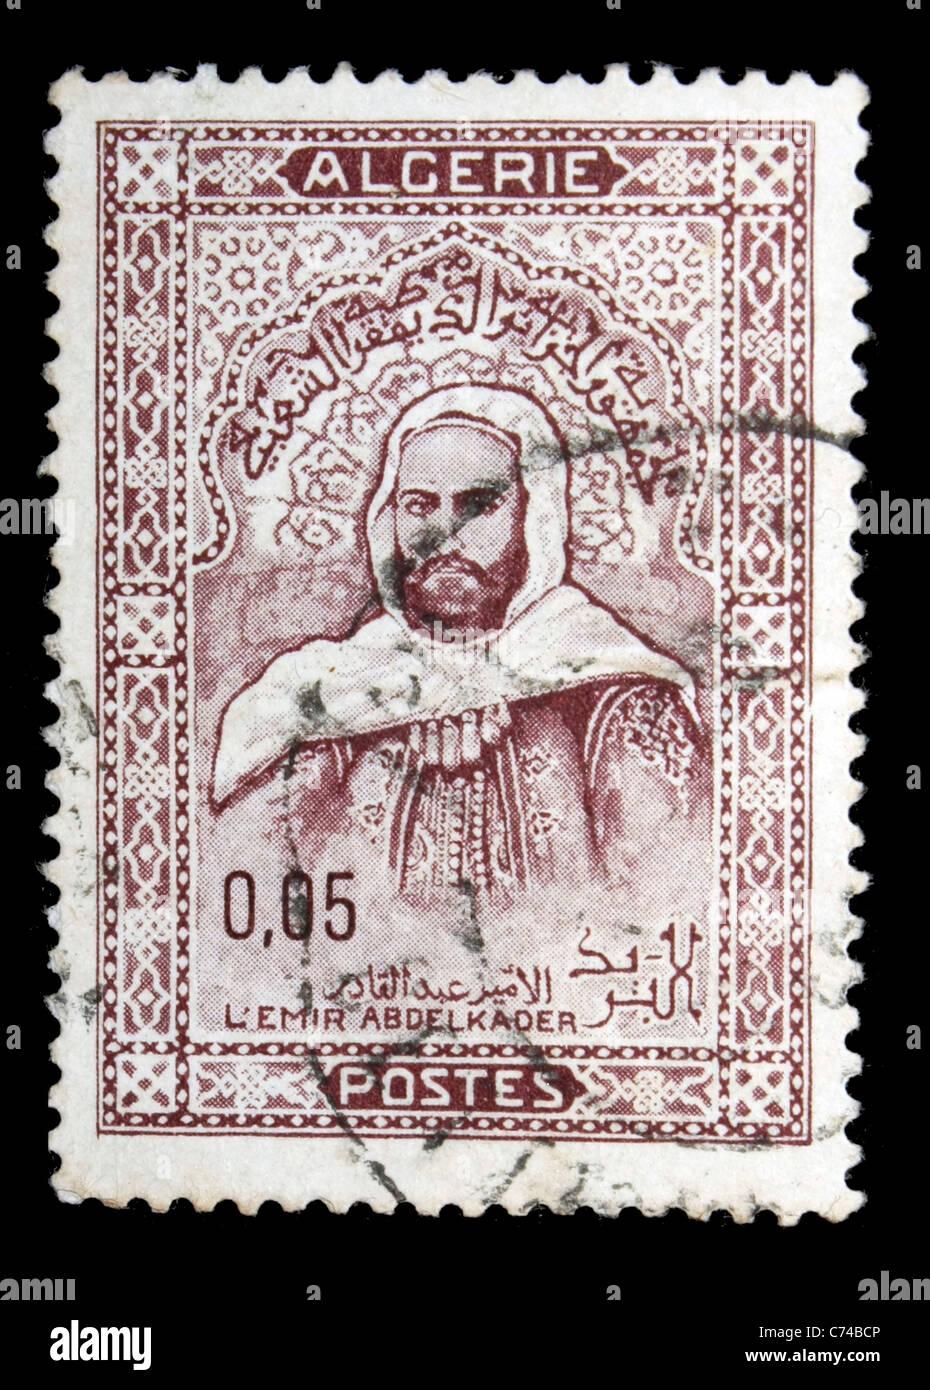 L'Emir Abdelkader Algérie timbre-poste Photo Stock